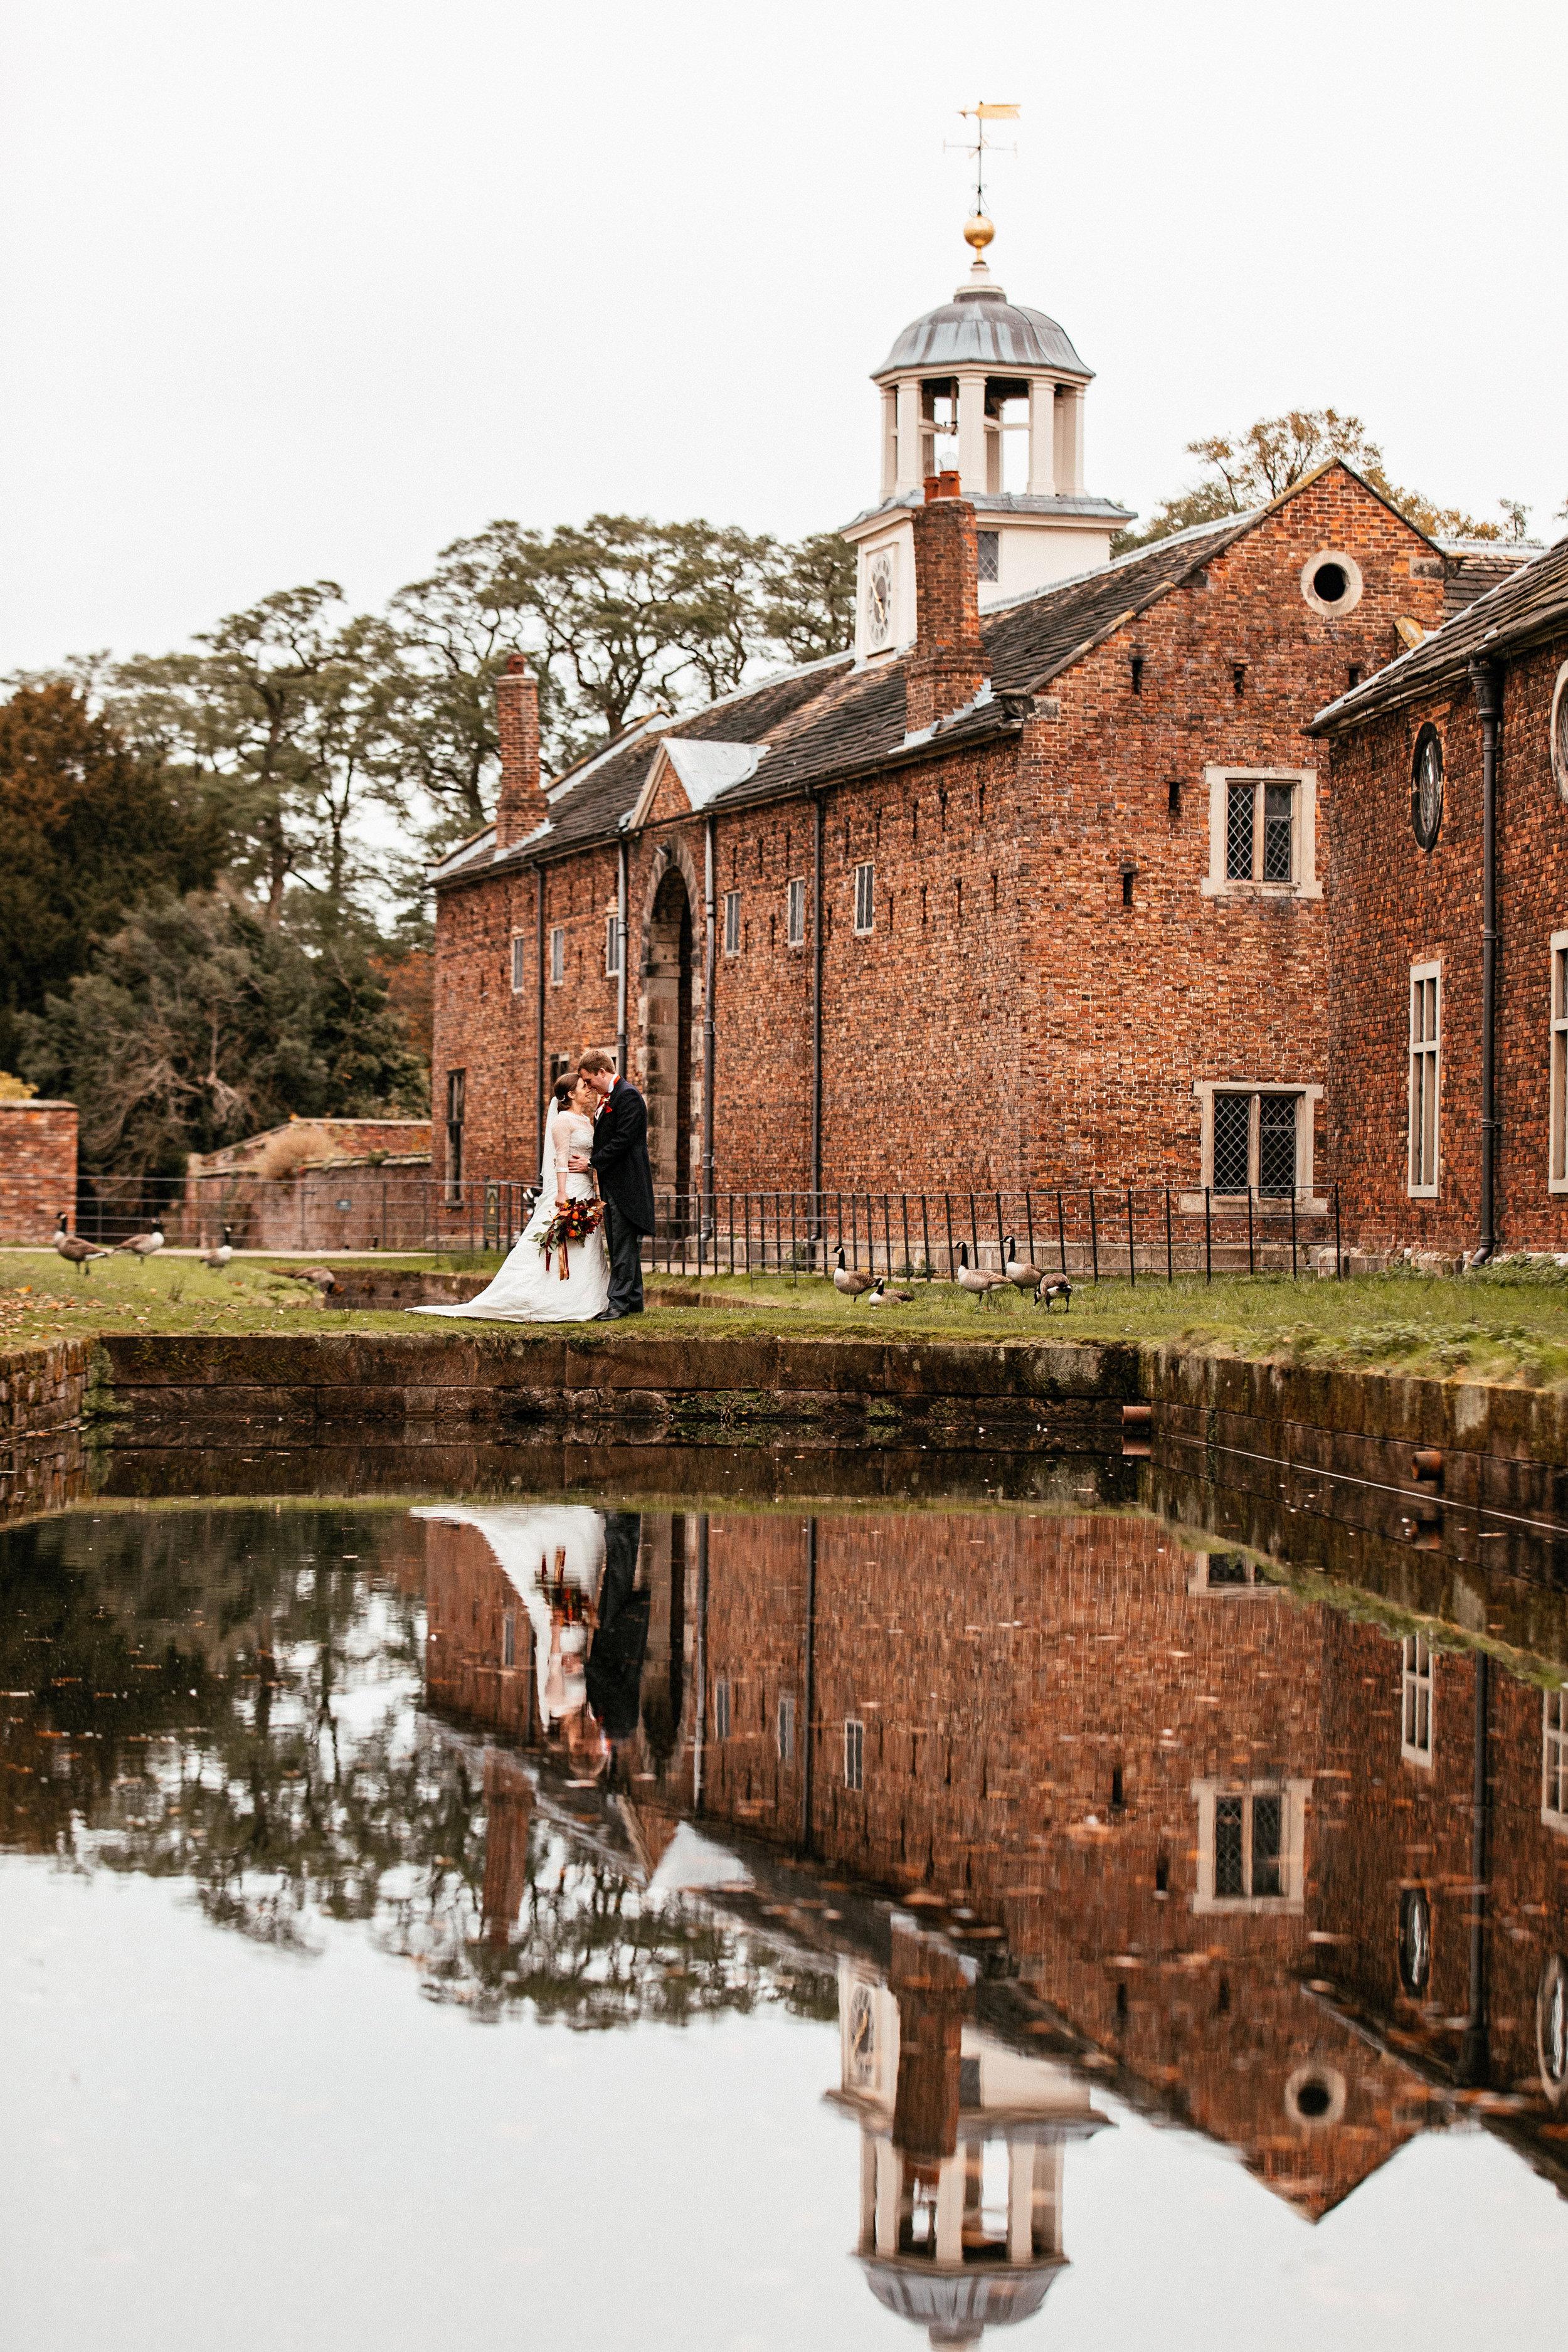 Dunham-Massey-Wedding-Photographer-93.jpg